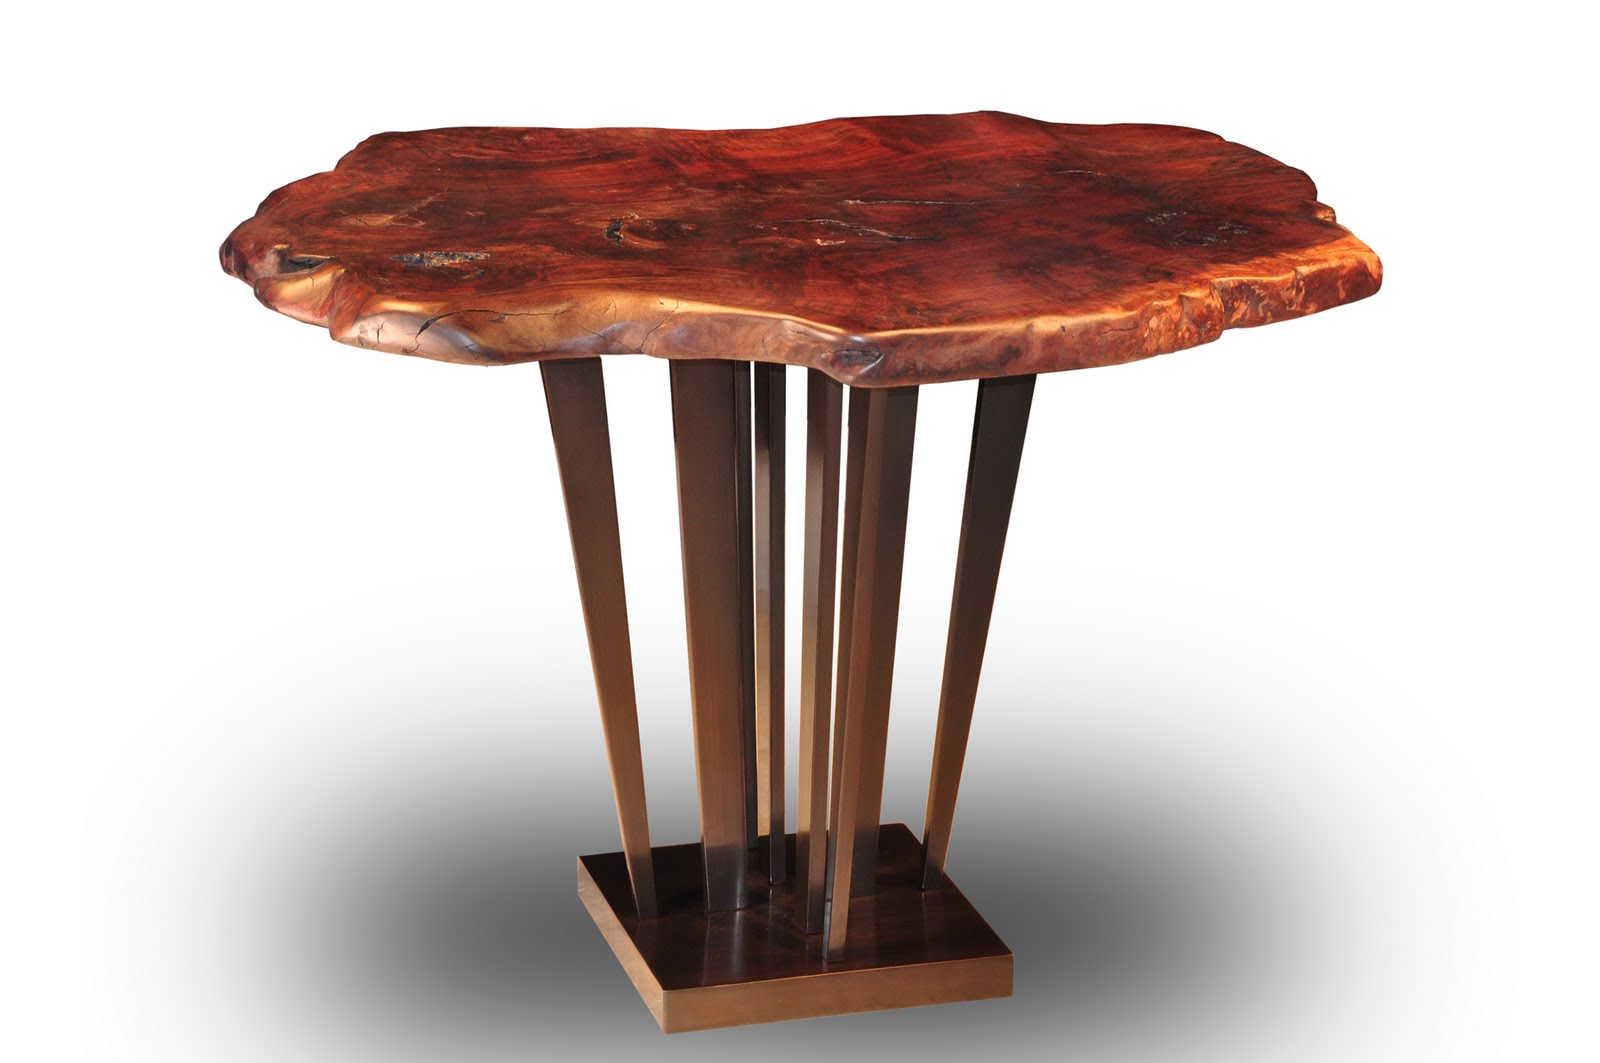 Claro Walnut Burl Slab Tree Trunk Table With Sunshine Bronze Pedestal Base